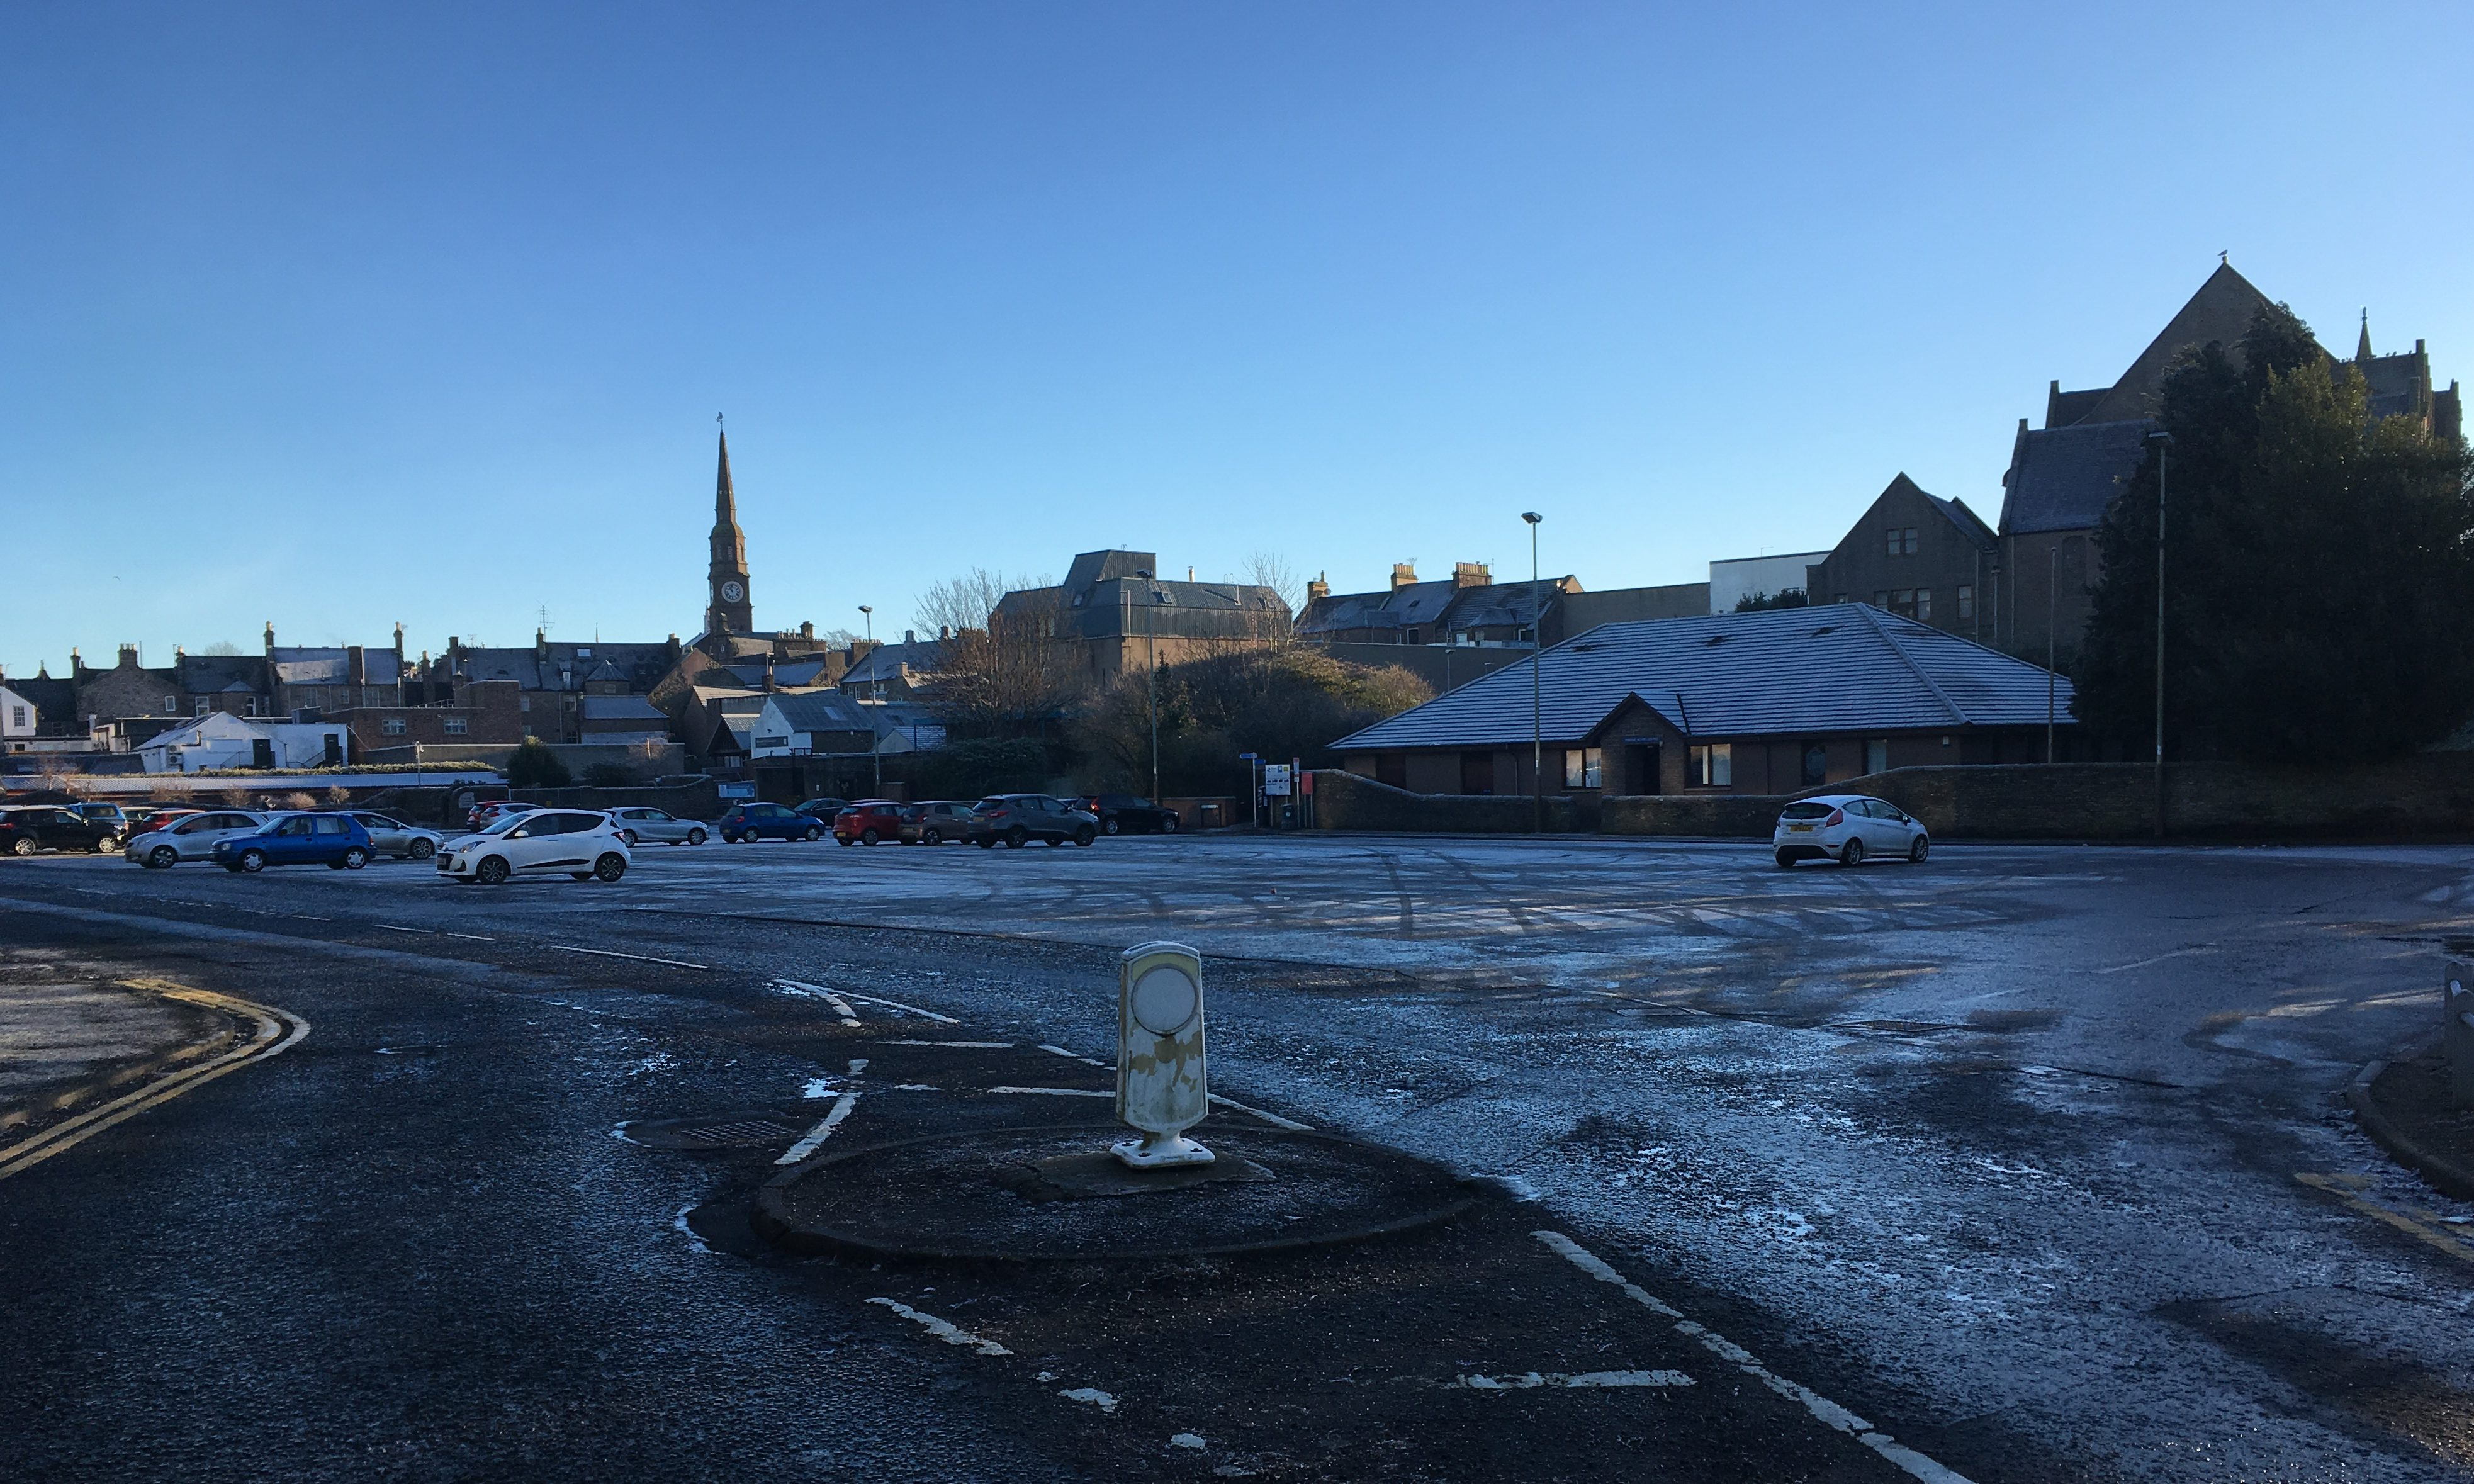 Forfar's Myre car park was virtually deserted on Christmas Eve morning